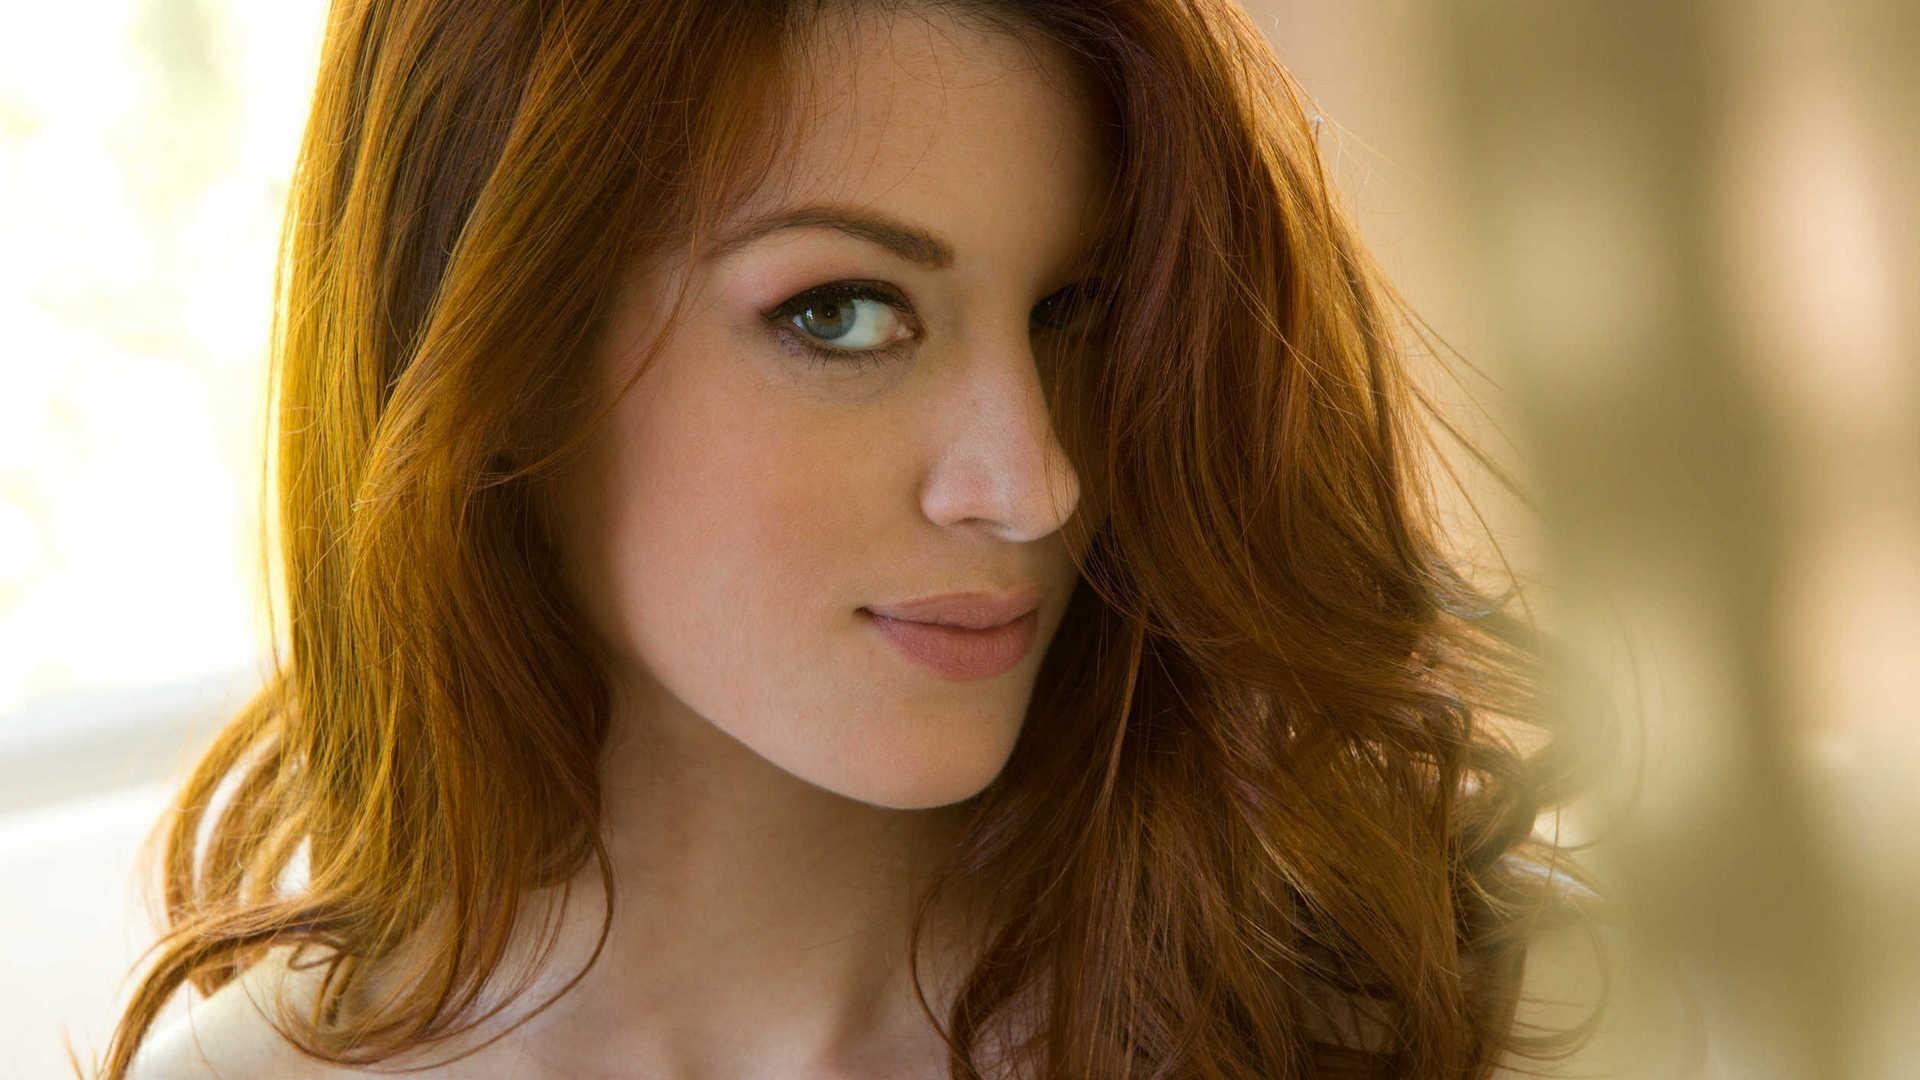 Red head porn star women